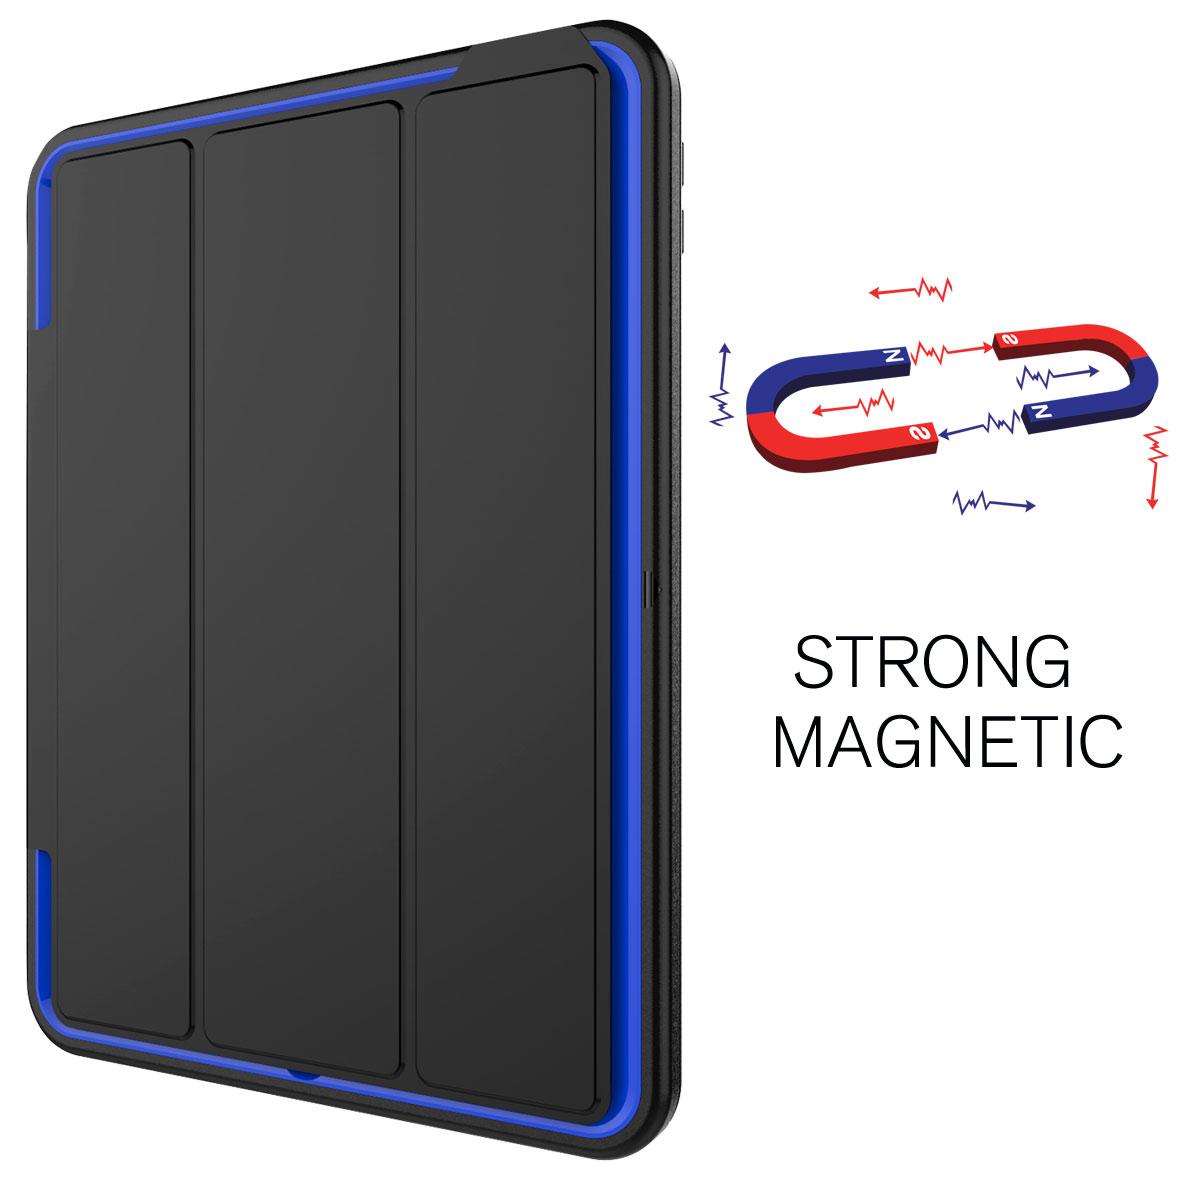 shockproof screen protector hard cover case for apple ipad. Black Bedroom Furniture Sets. Home Design Ideas